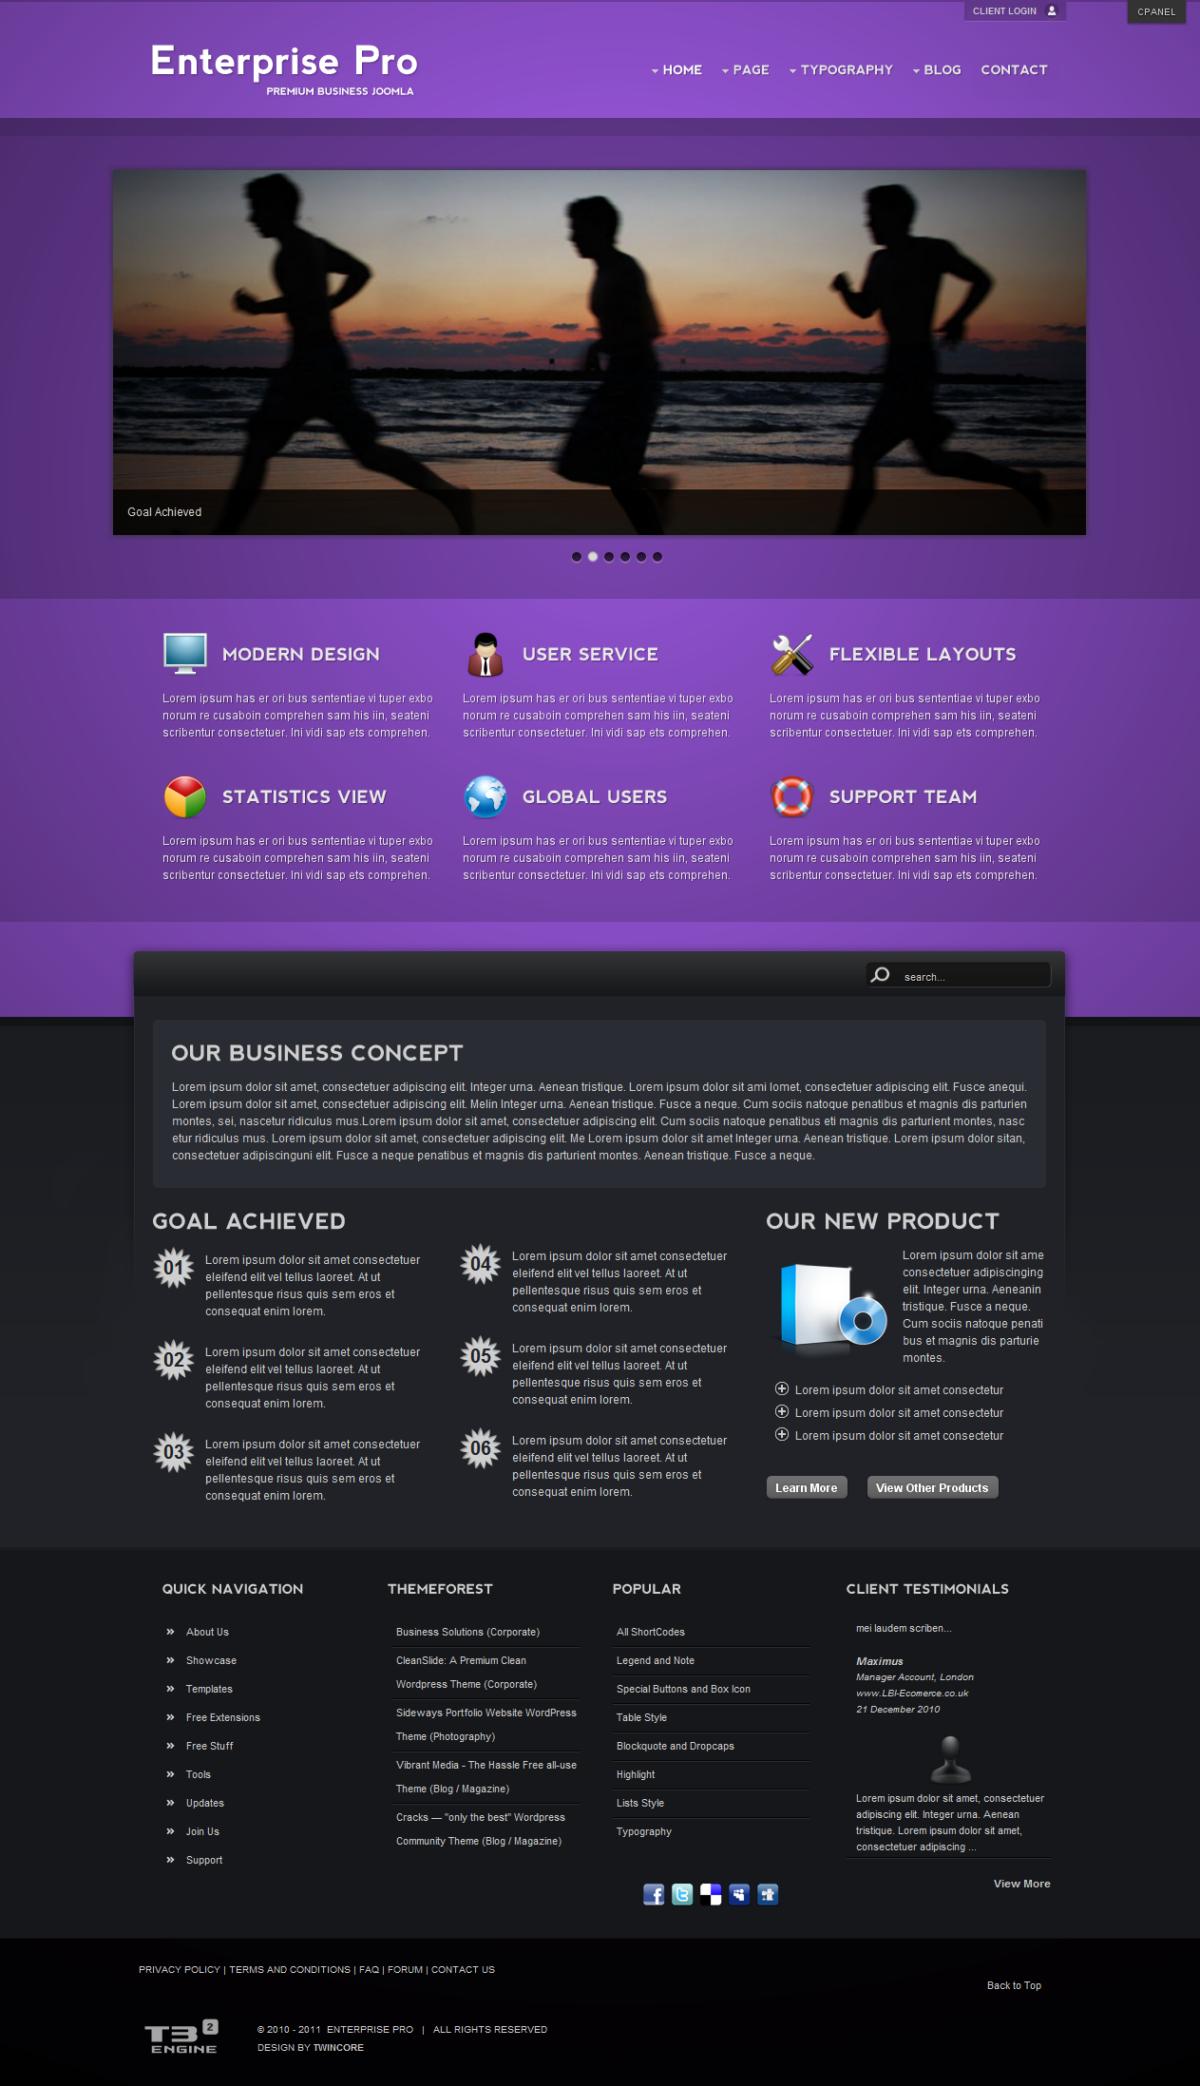 Enterprise Pro - Premium Business Joomla Template